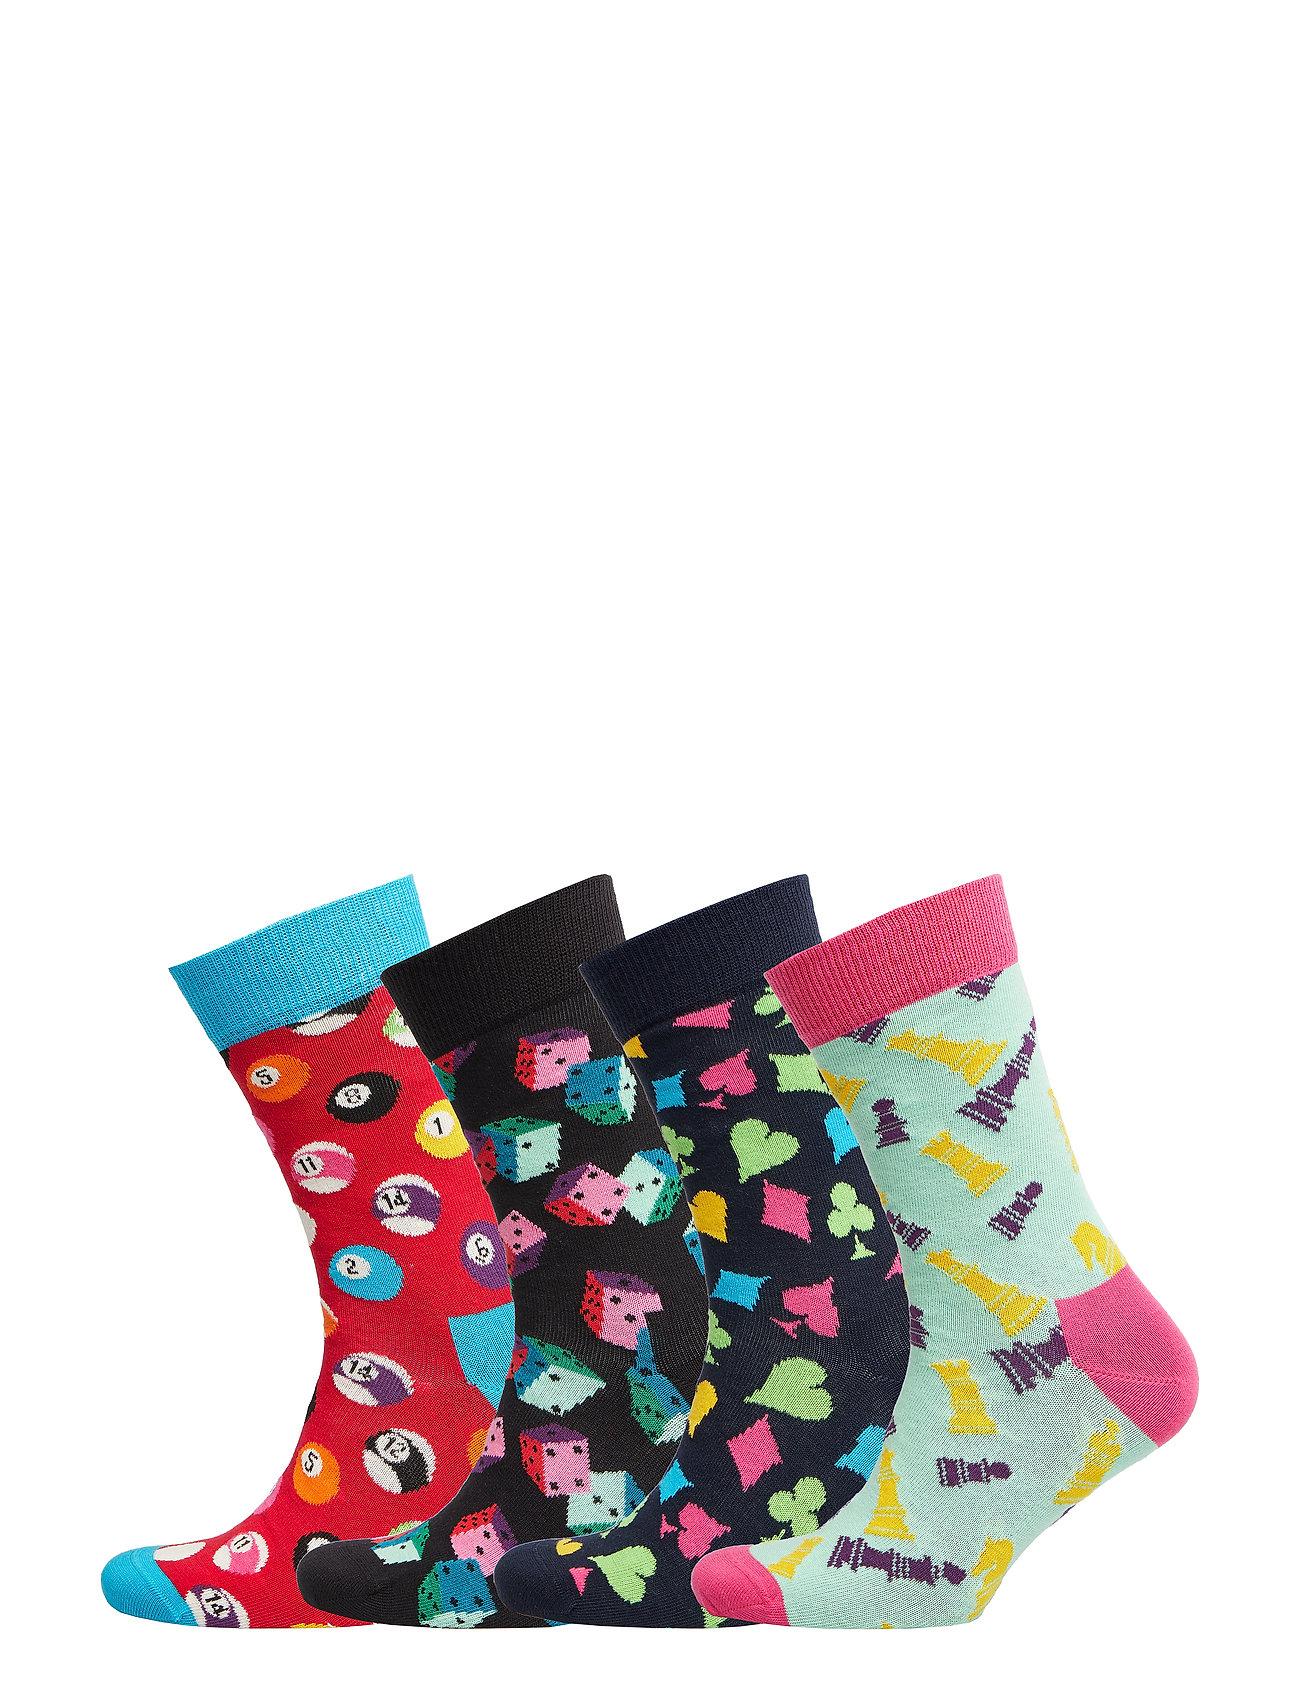 Gift Socks Game Game BoxblueHappy Night mN0wvOn8